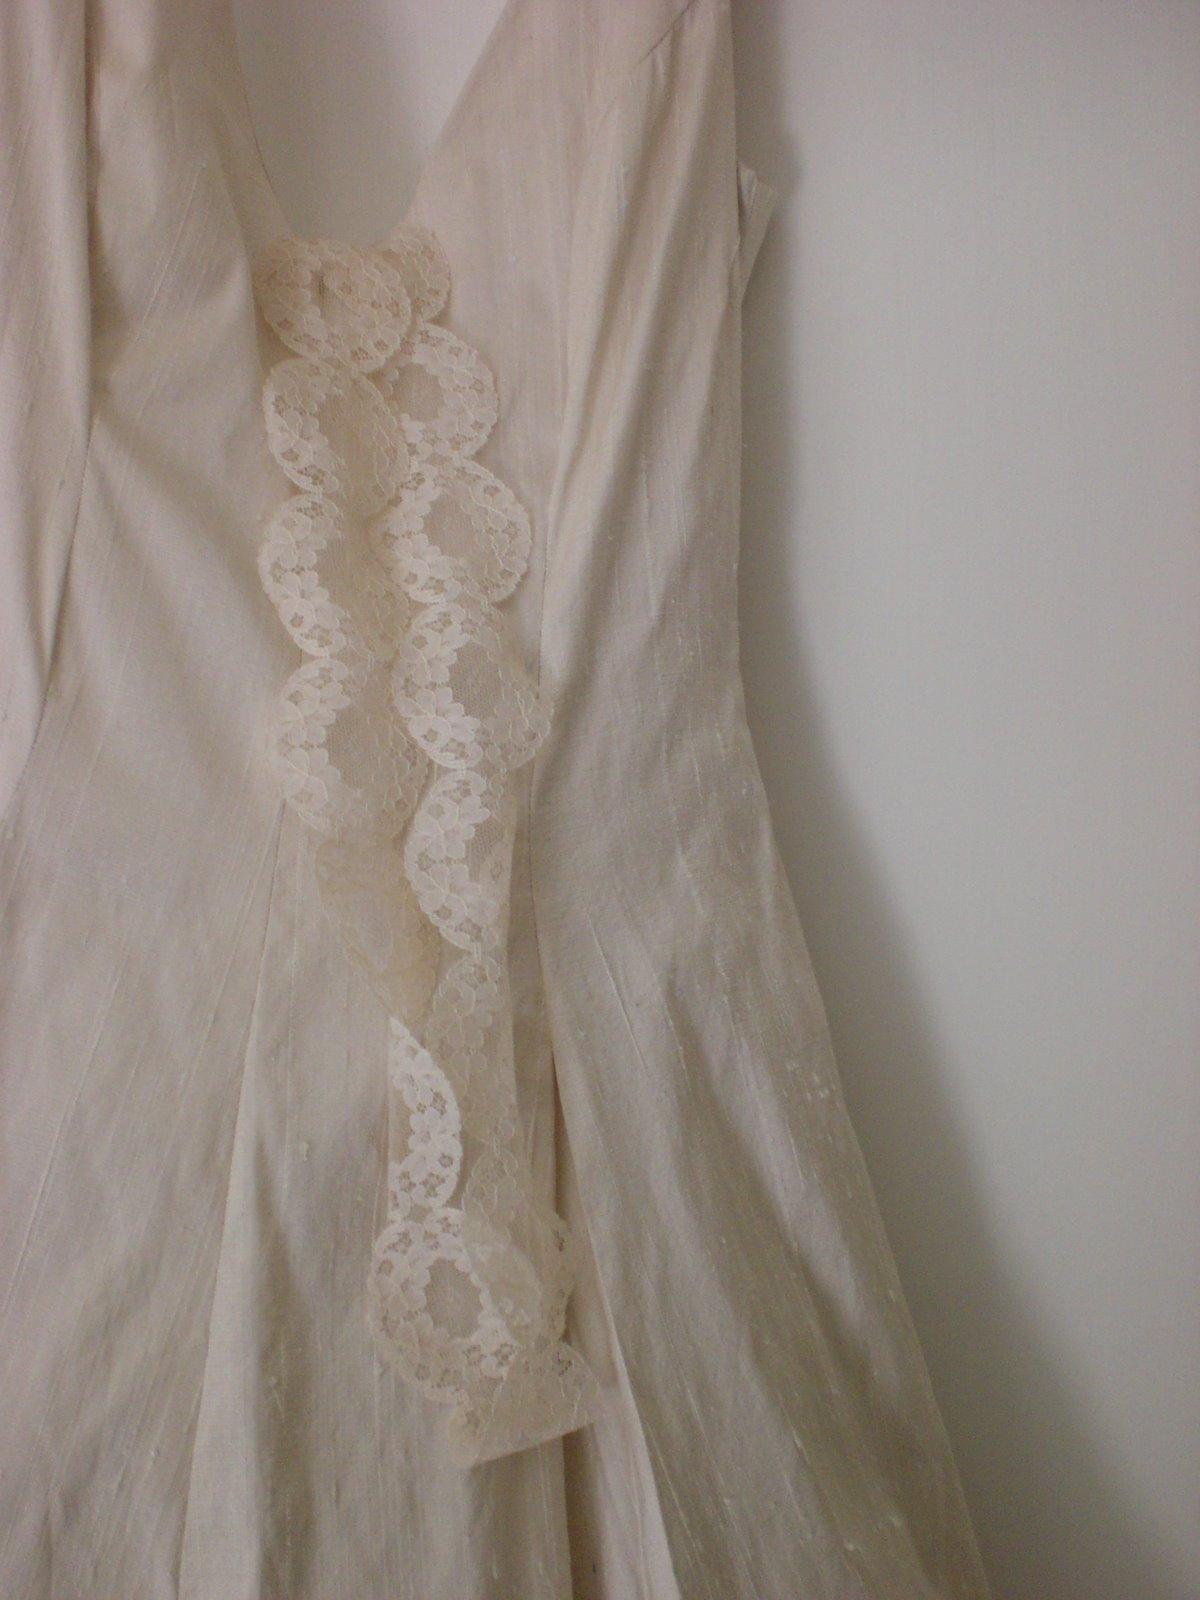 alone: my wedding dress